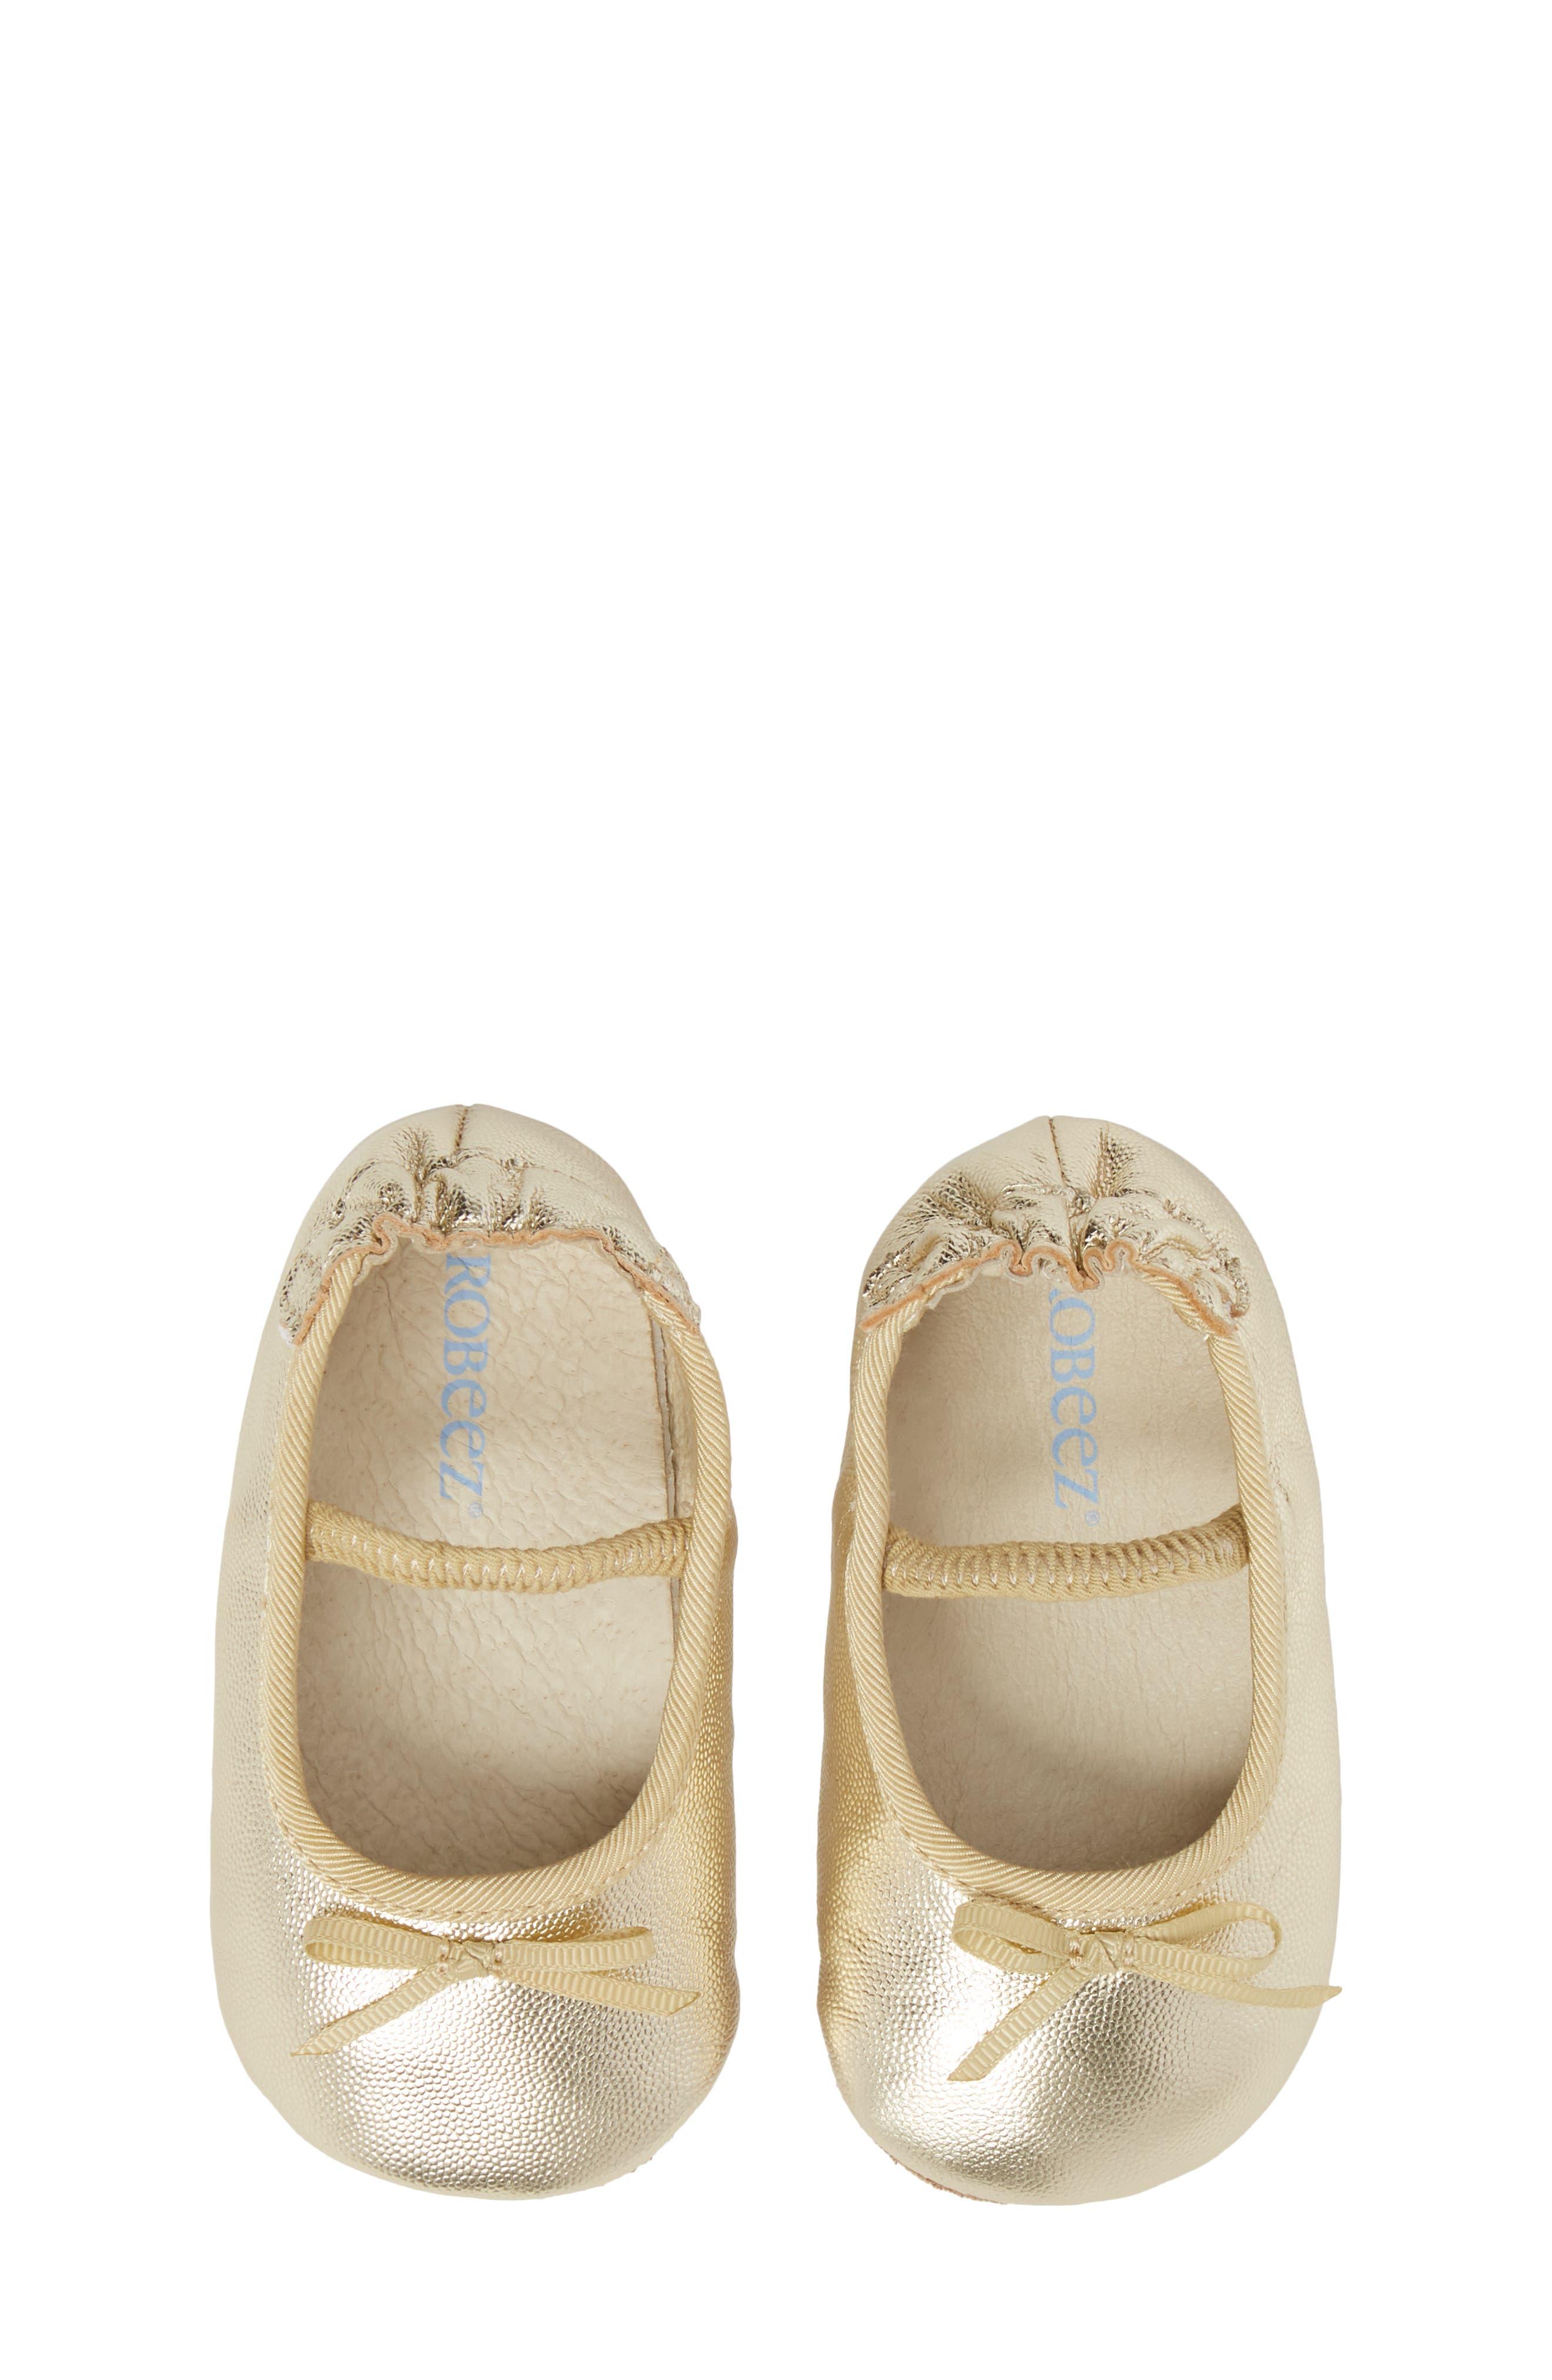 Athena Ballet Strap Crib Shoe,                             Alternate thumbnail 5, color,                             GOLD